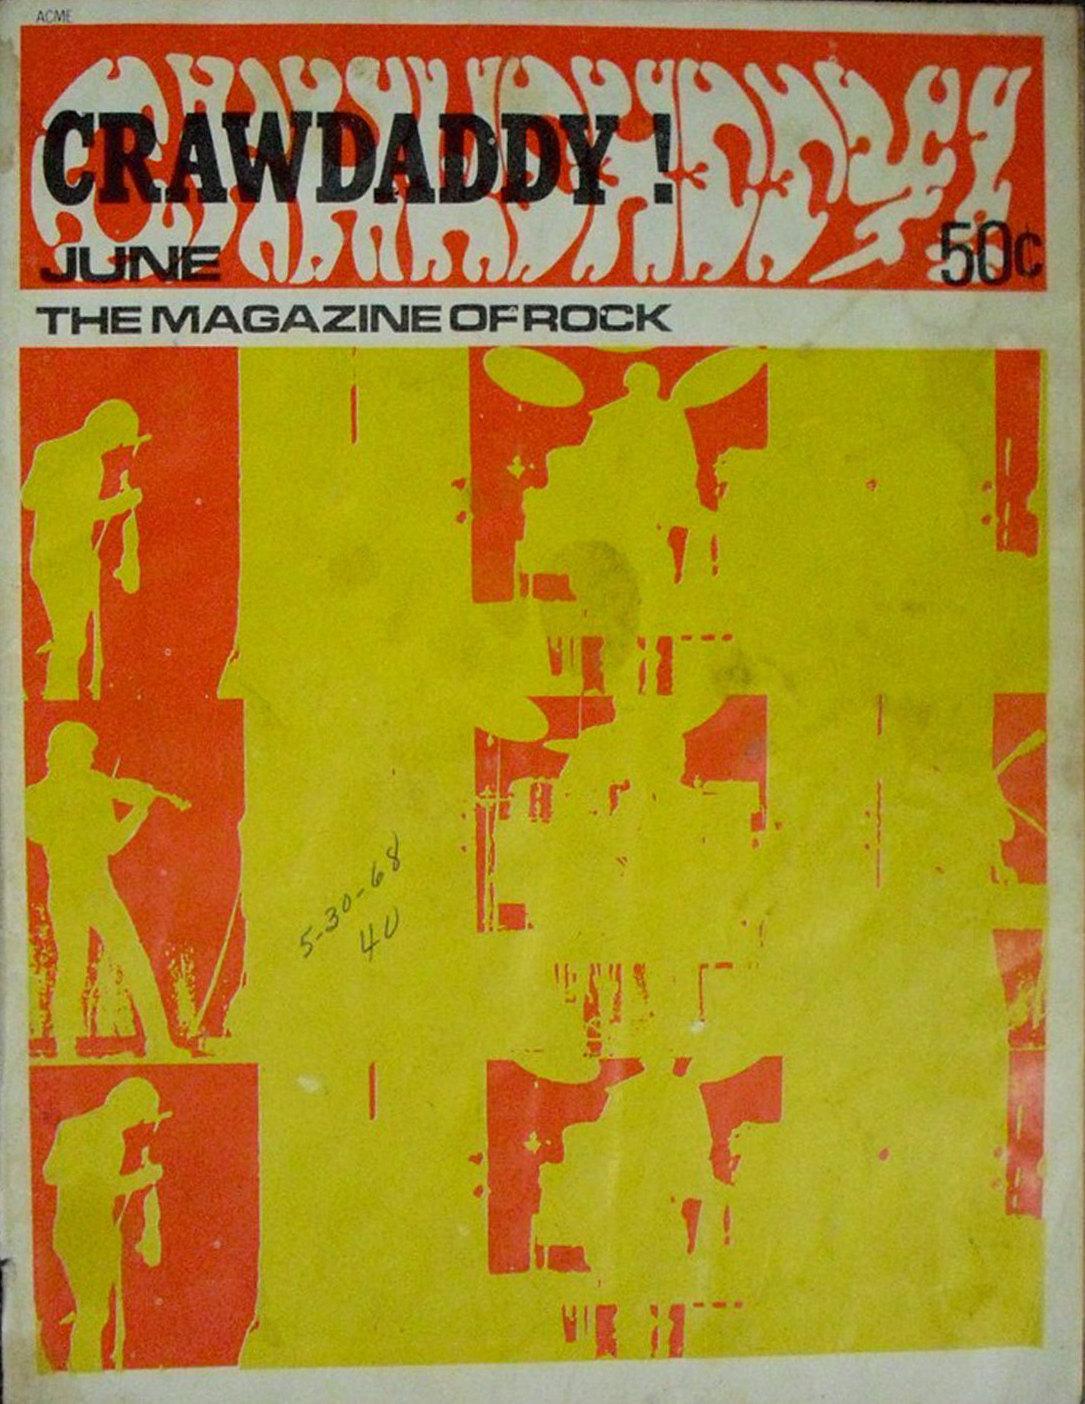 Remembering Paul Williams, Founder Of Rock Magazine 'Crawdaddy!'